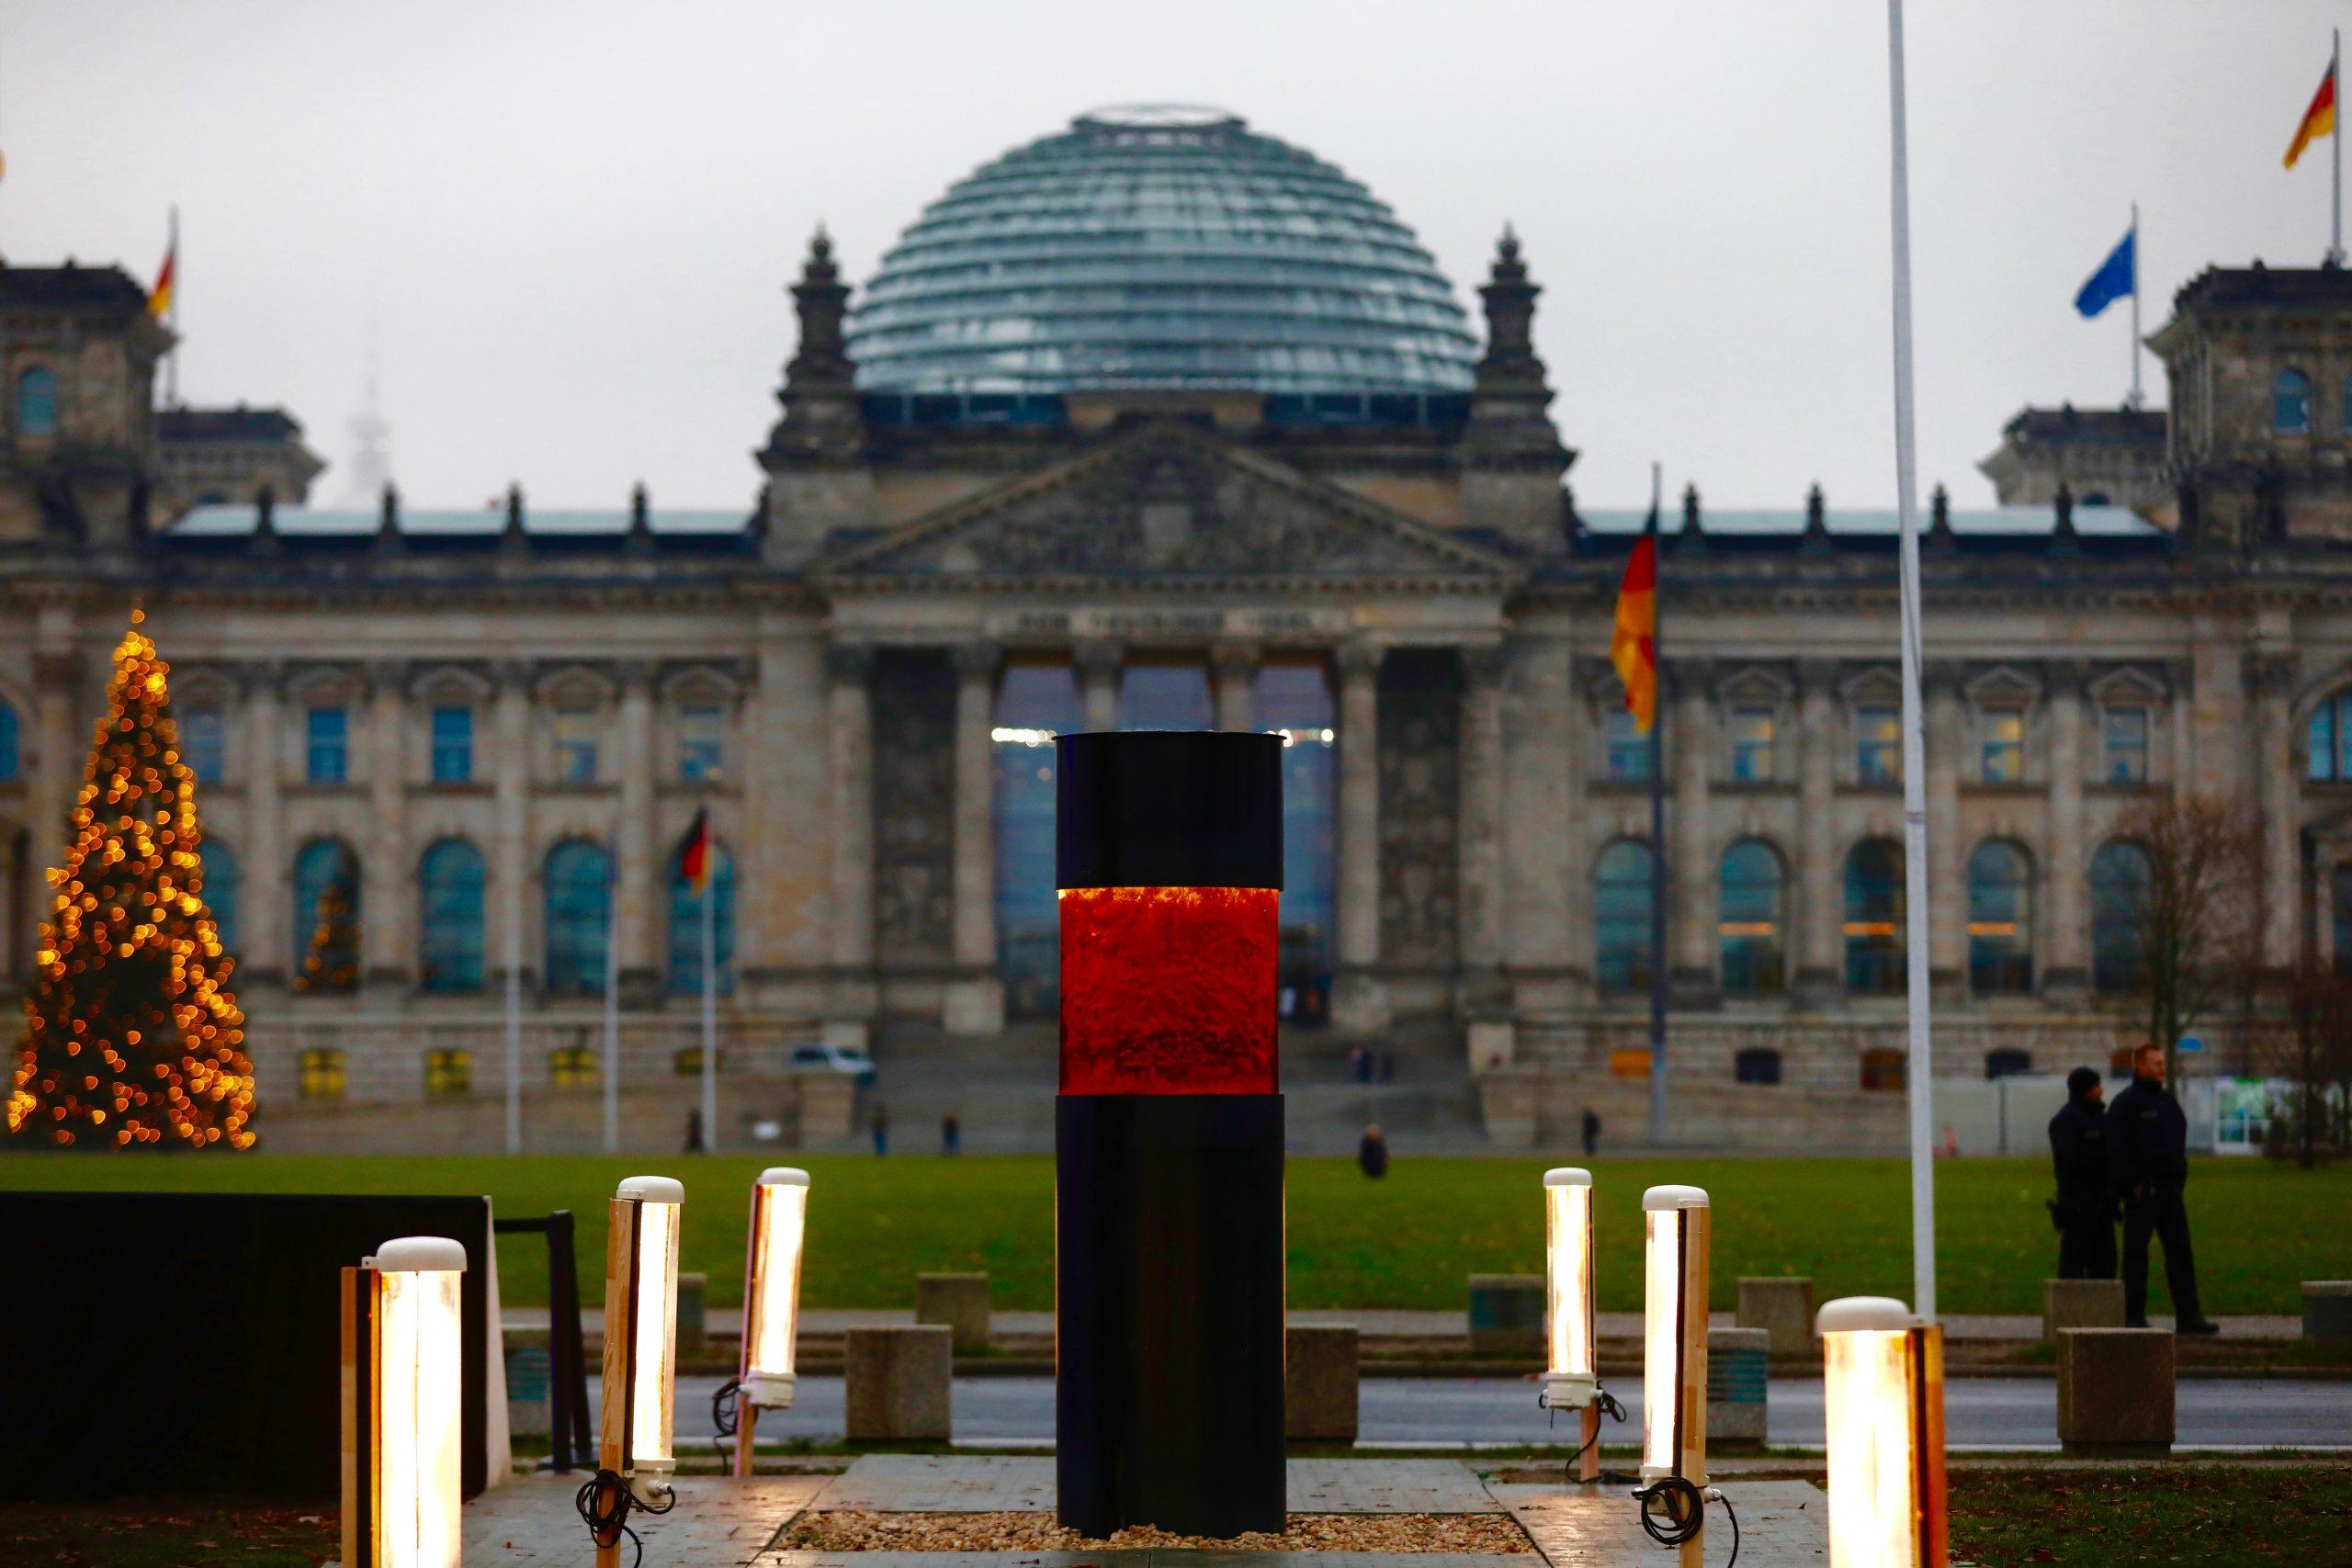 Kritik an Anti-AfD-Gedenksäule des ZPS reißt nicht ab